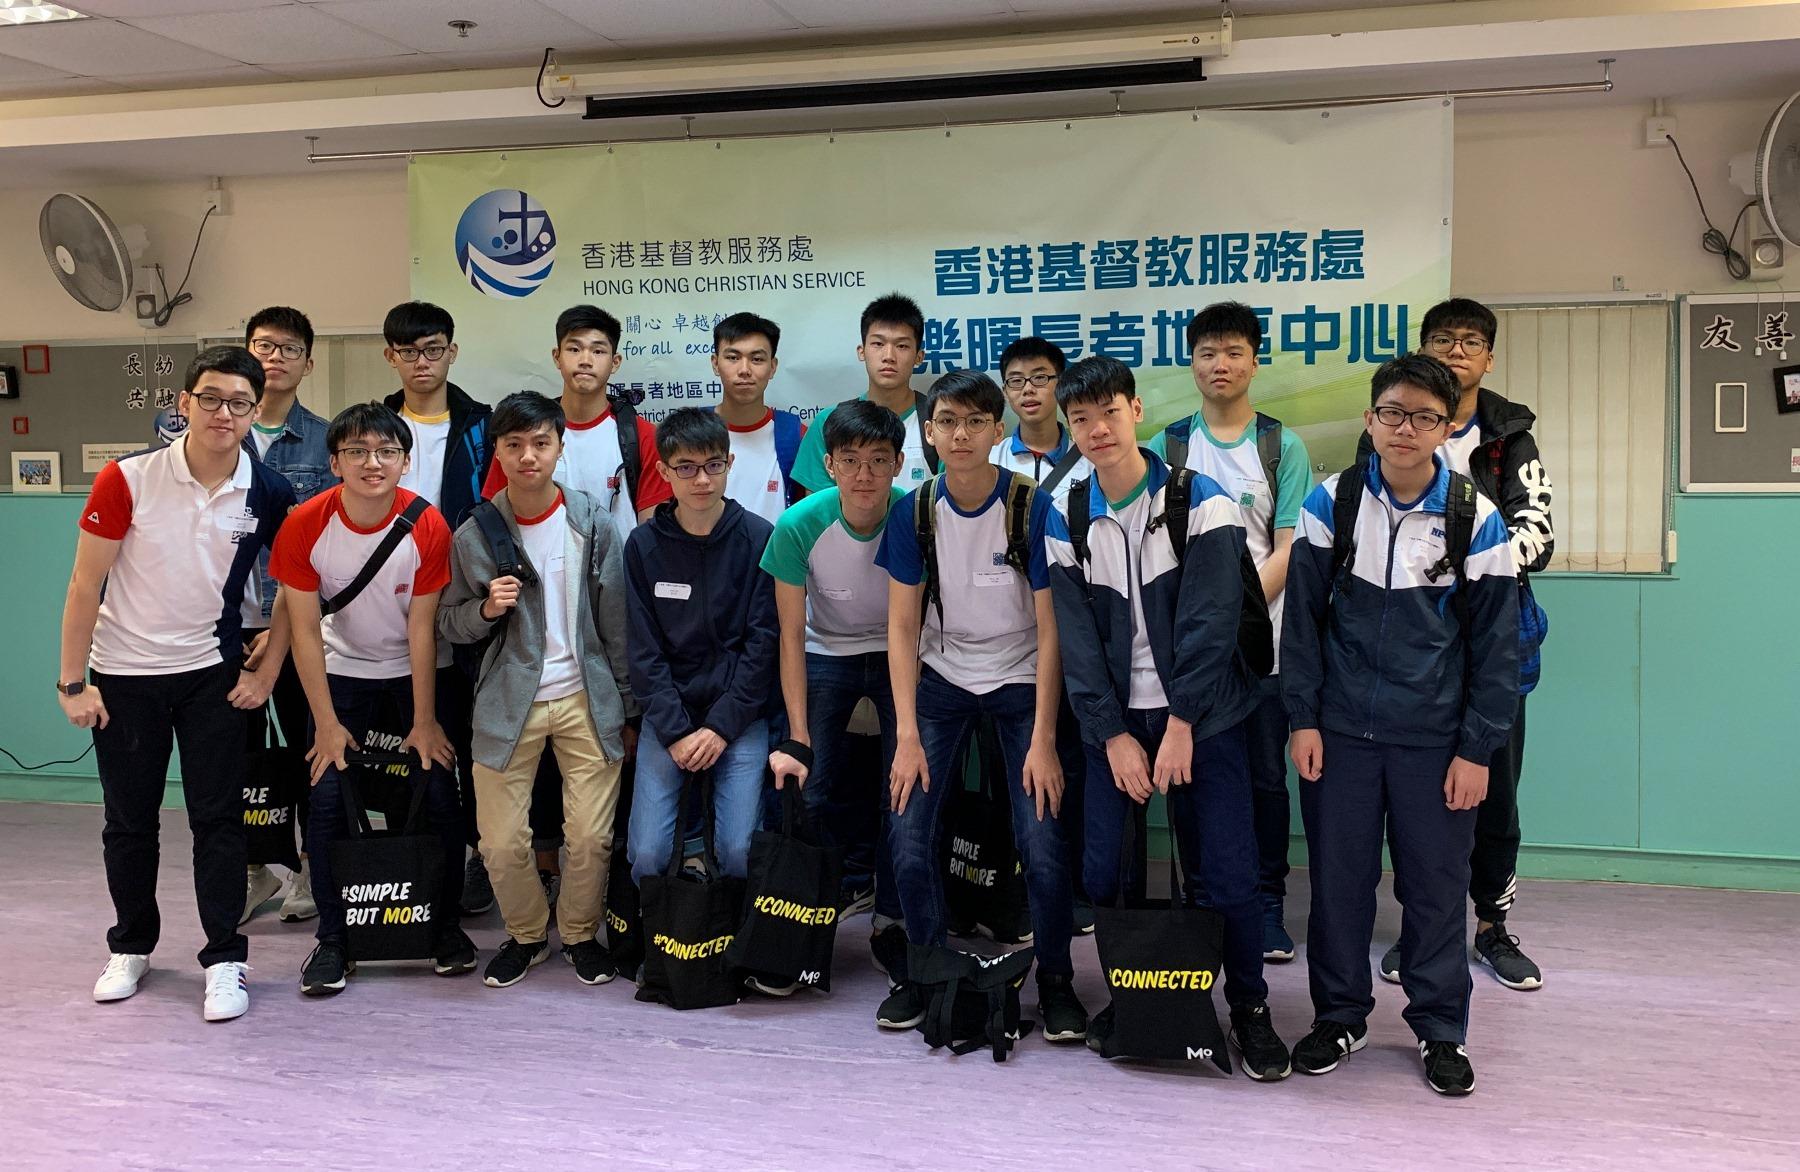 http://npc.edu.hk/sites/default/files/img_1055.jpg